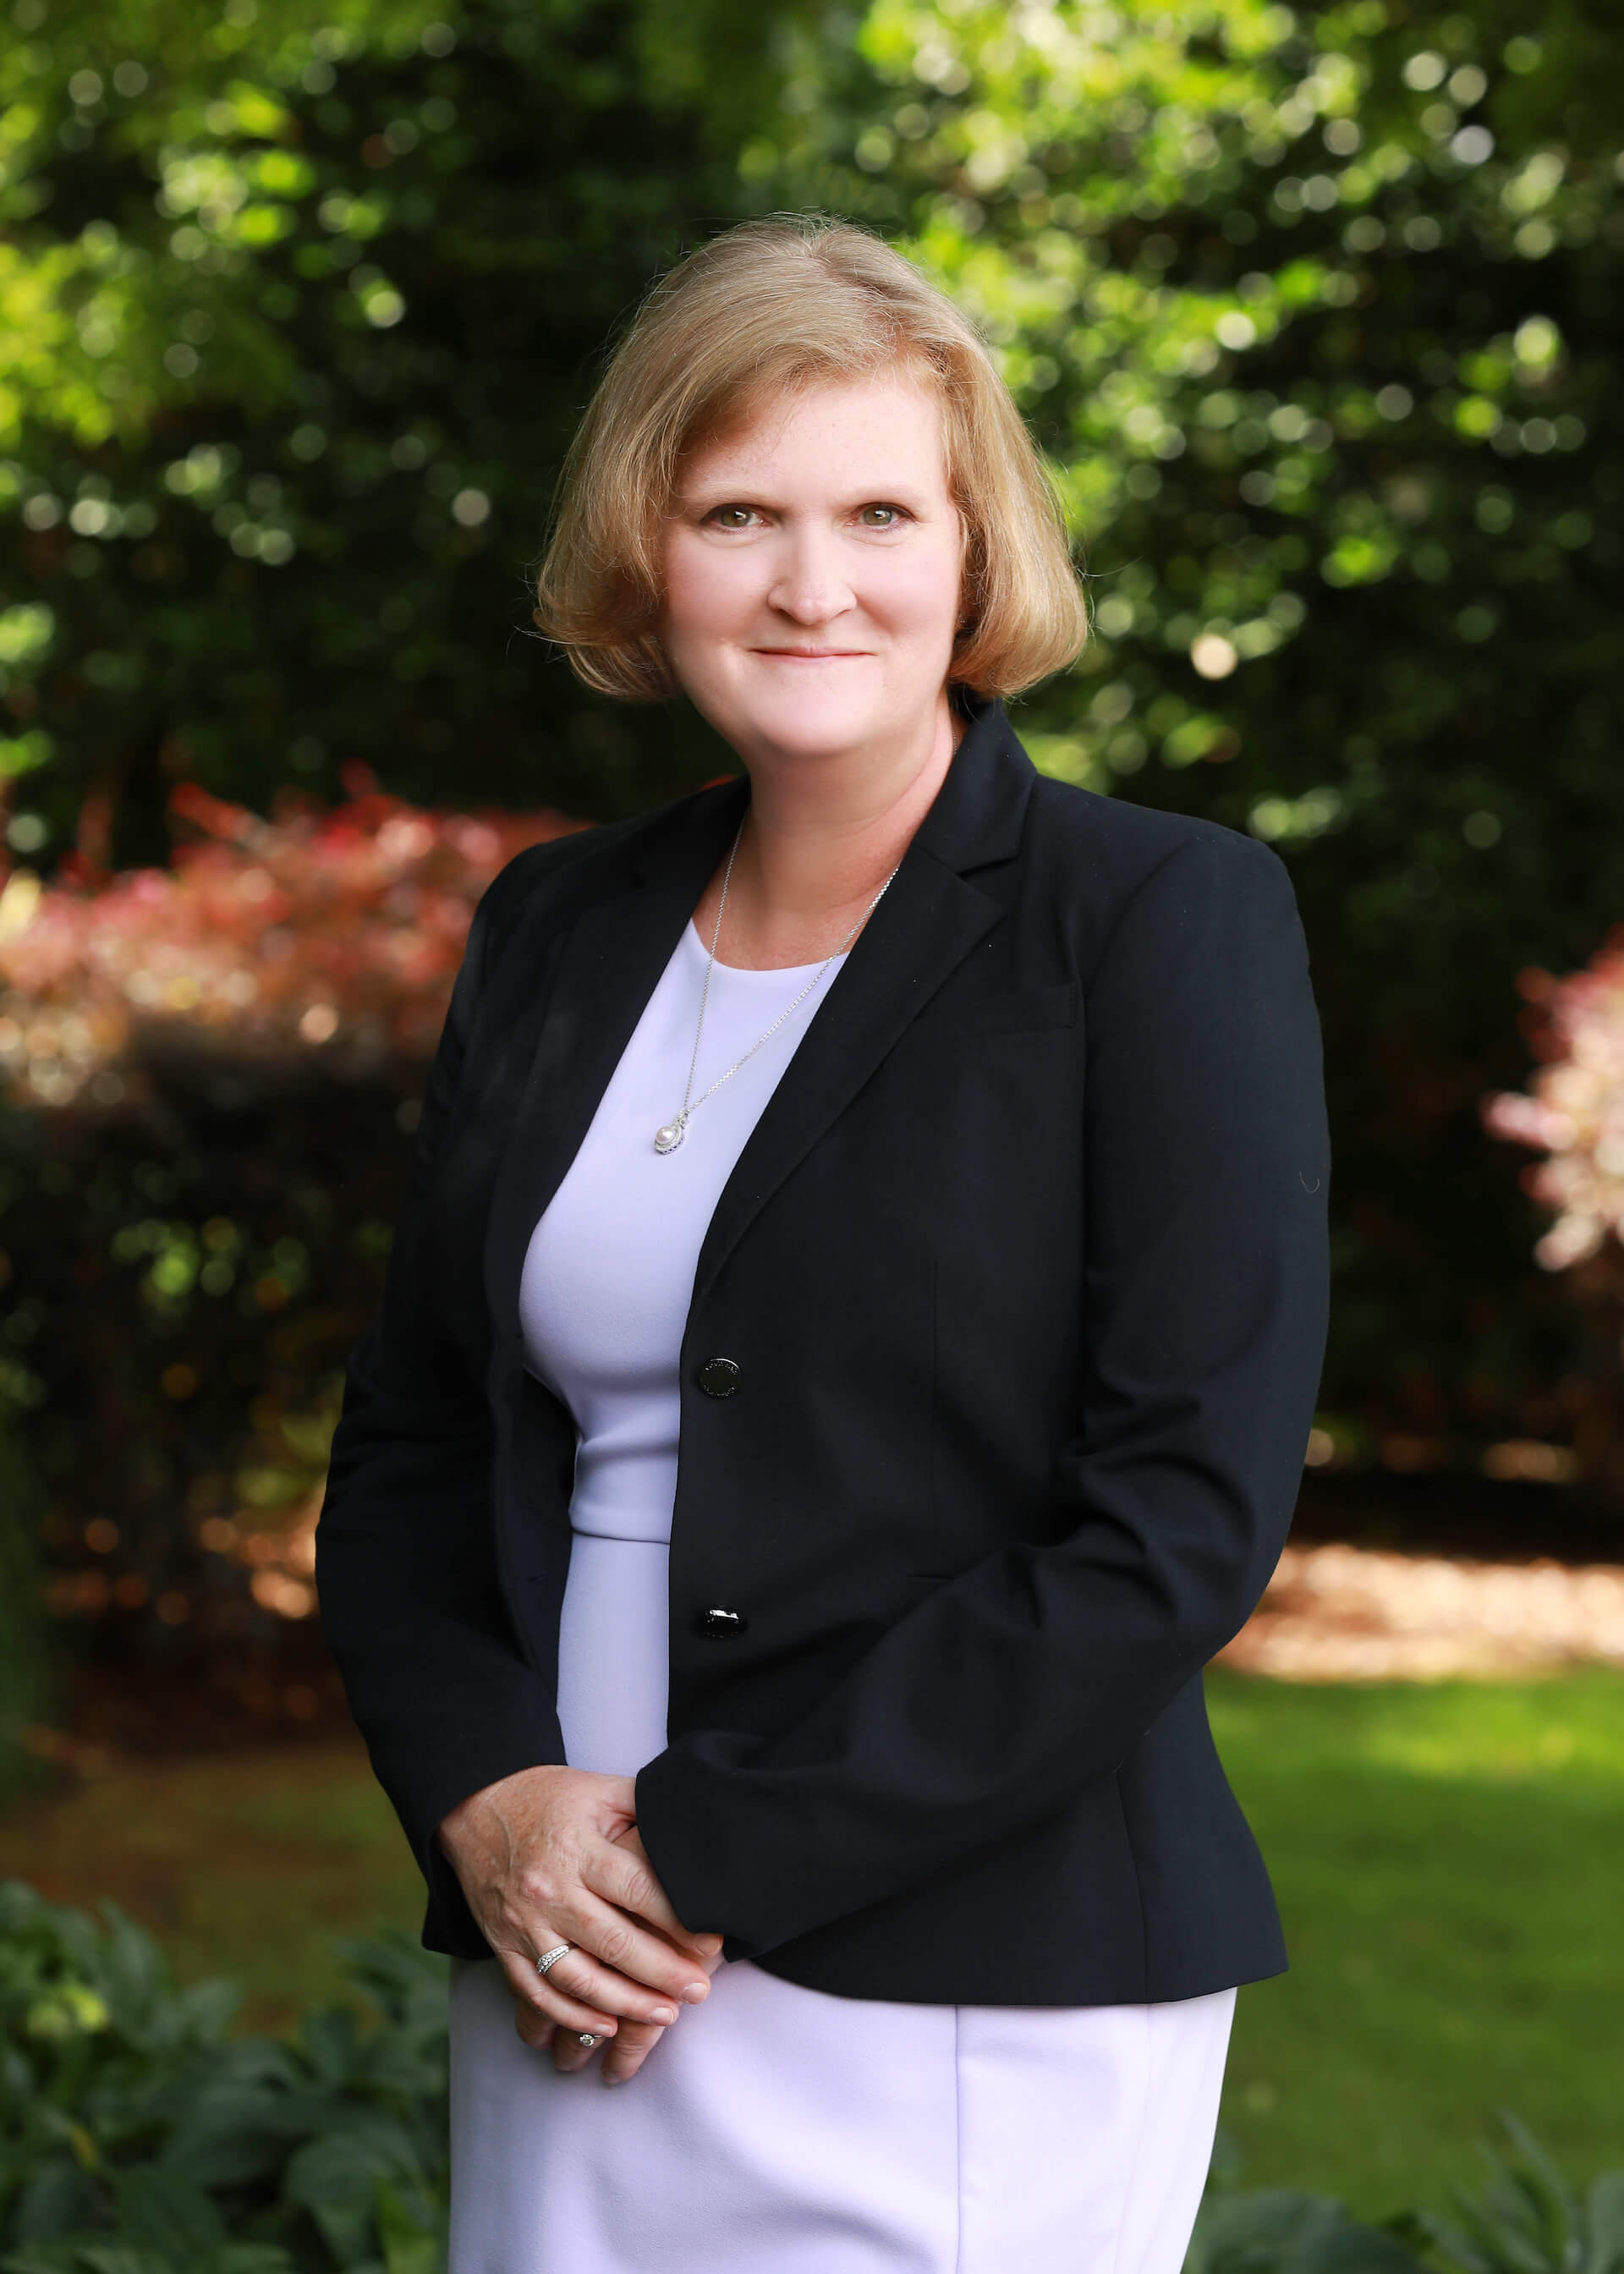 Jennifer M. Matthews